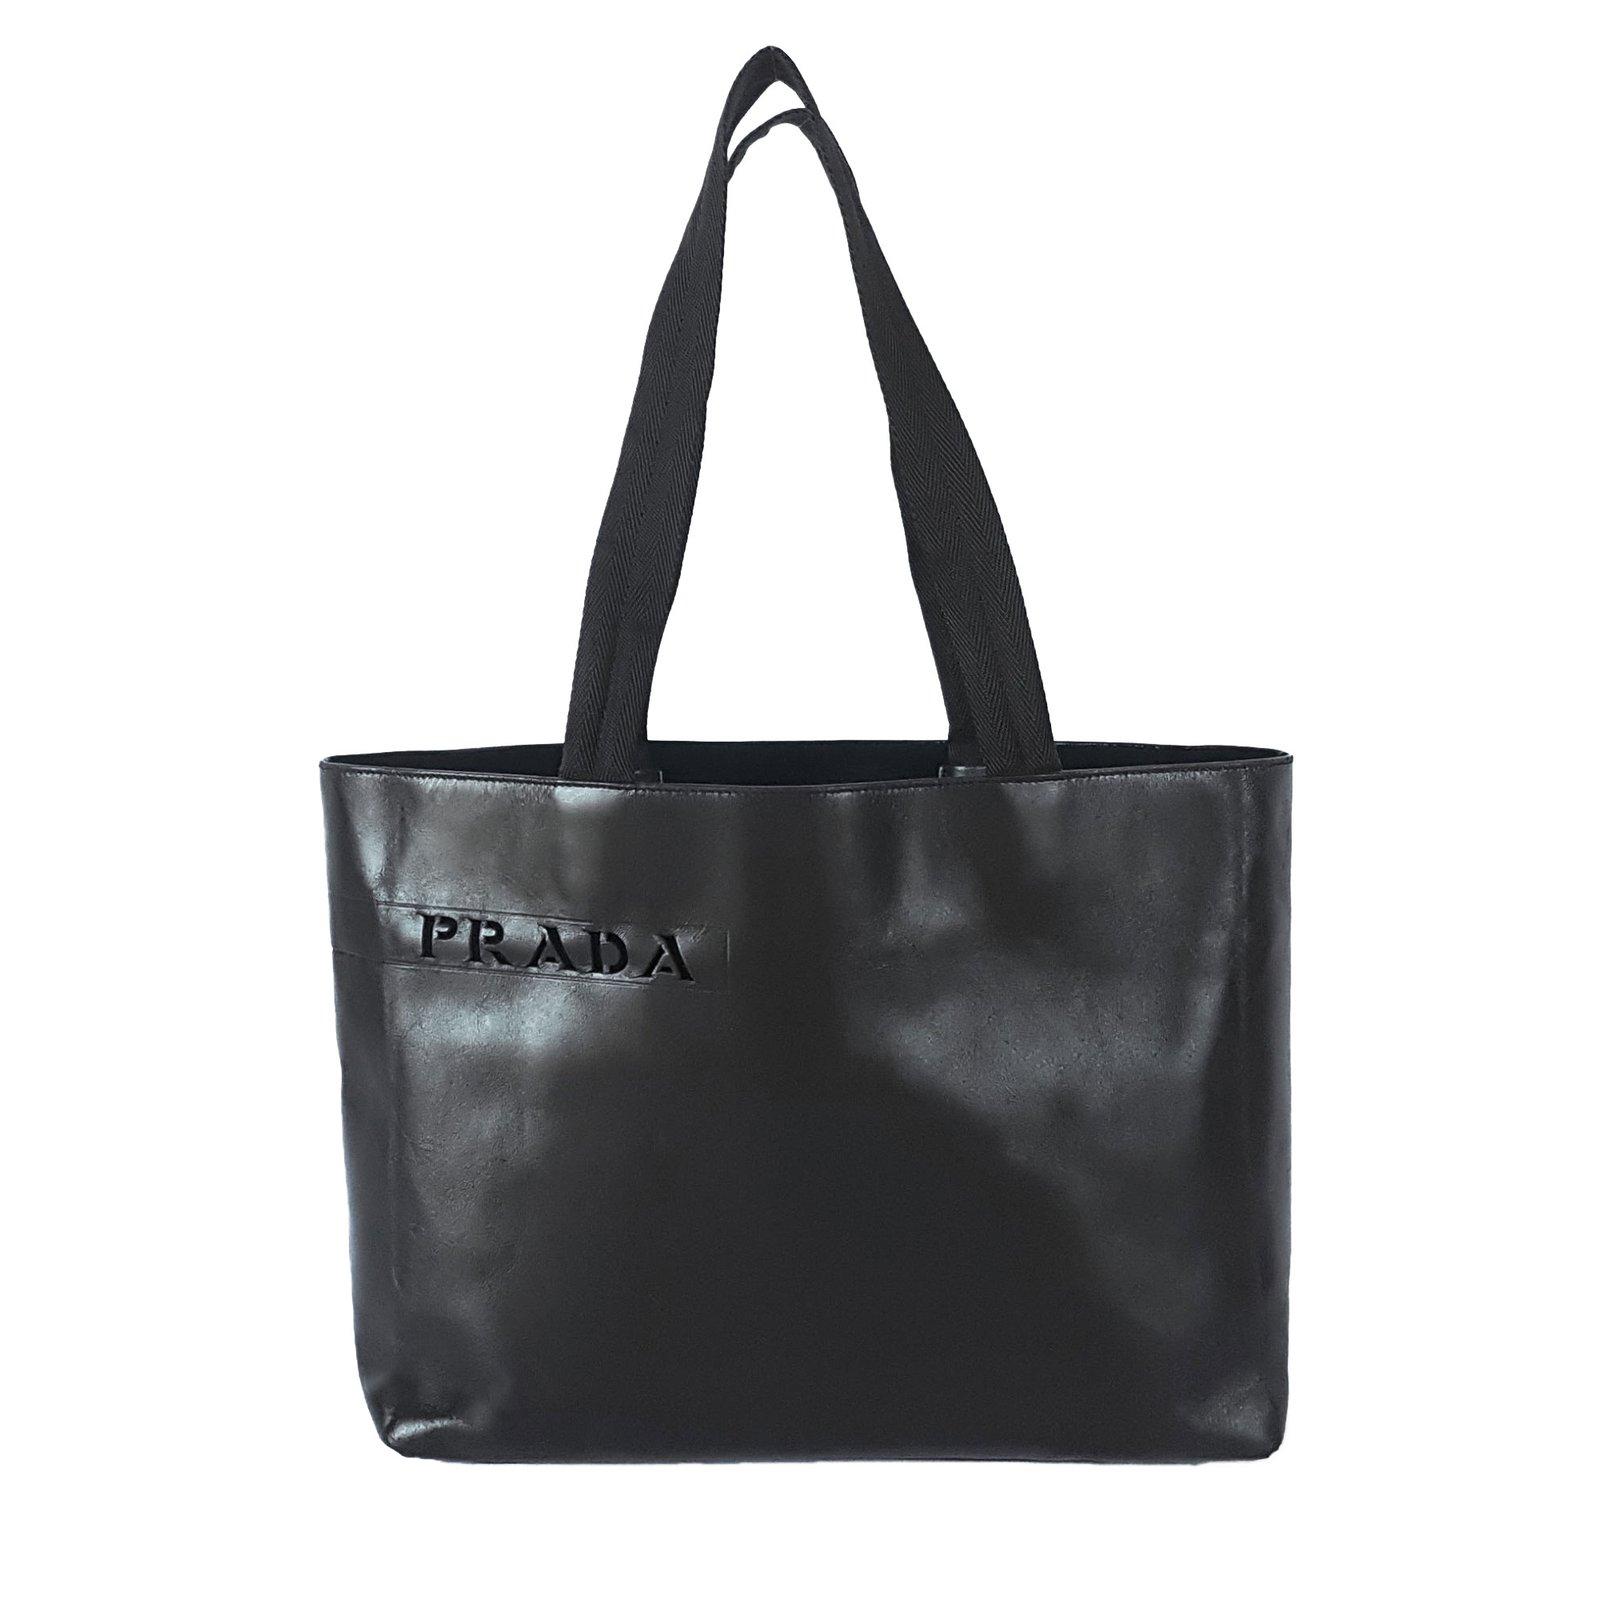 Prada Handbags Leather Olive Green Ref 62183